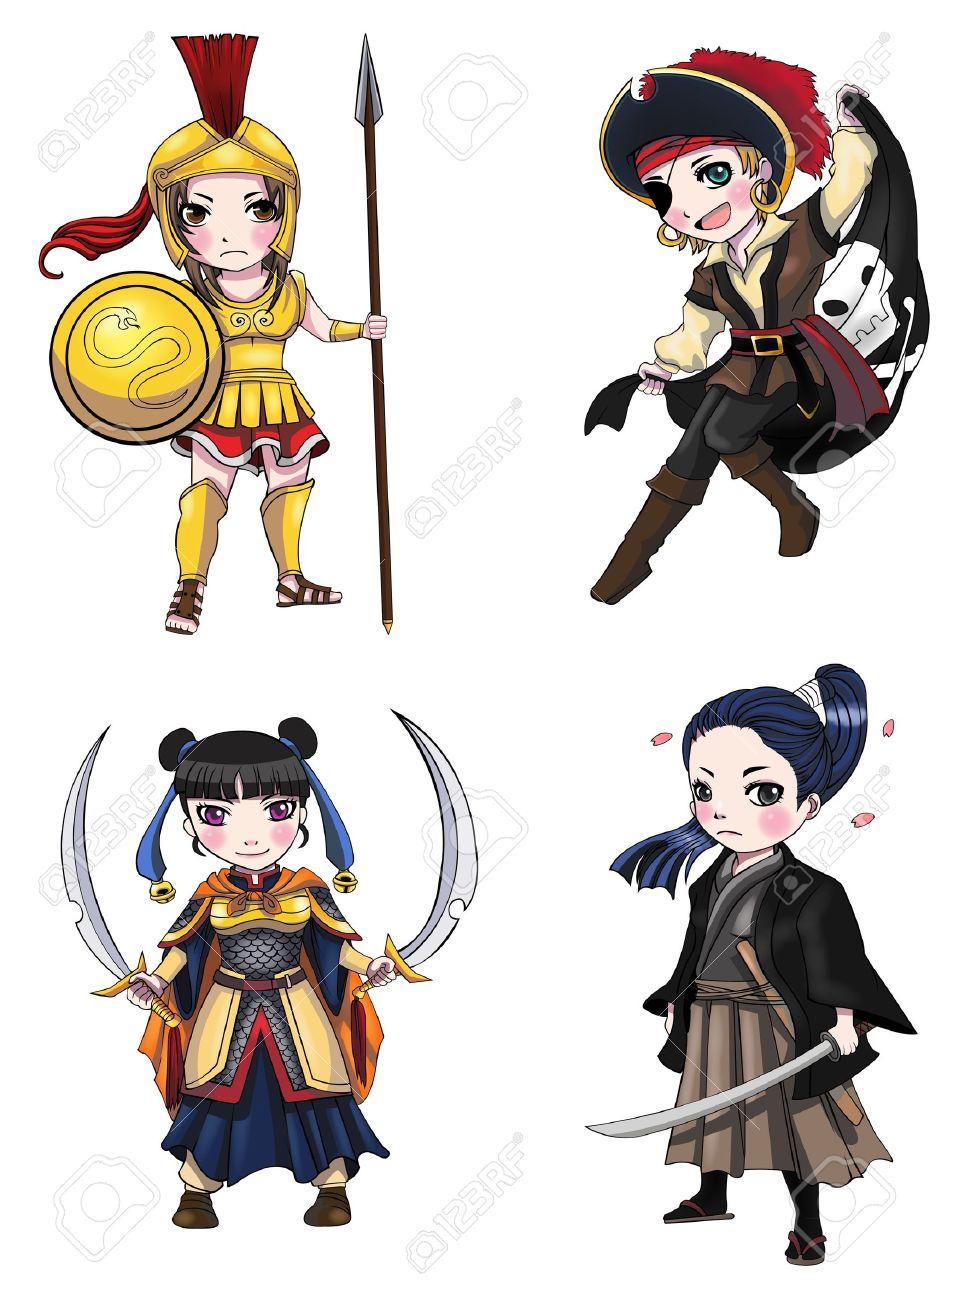 Women Warrior clipart #17, Download drawings